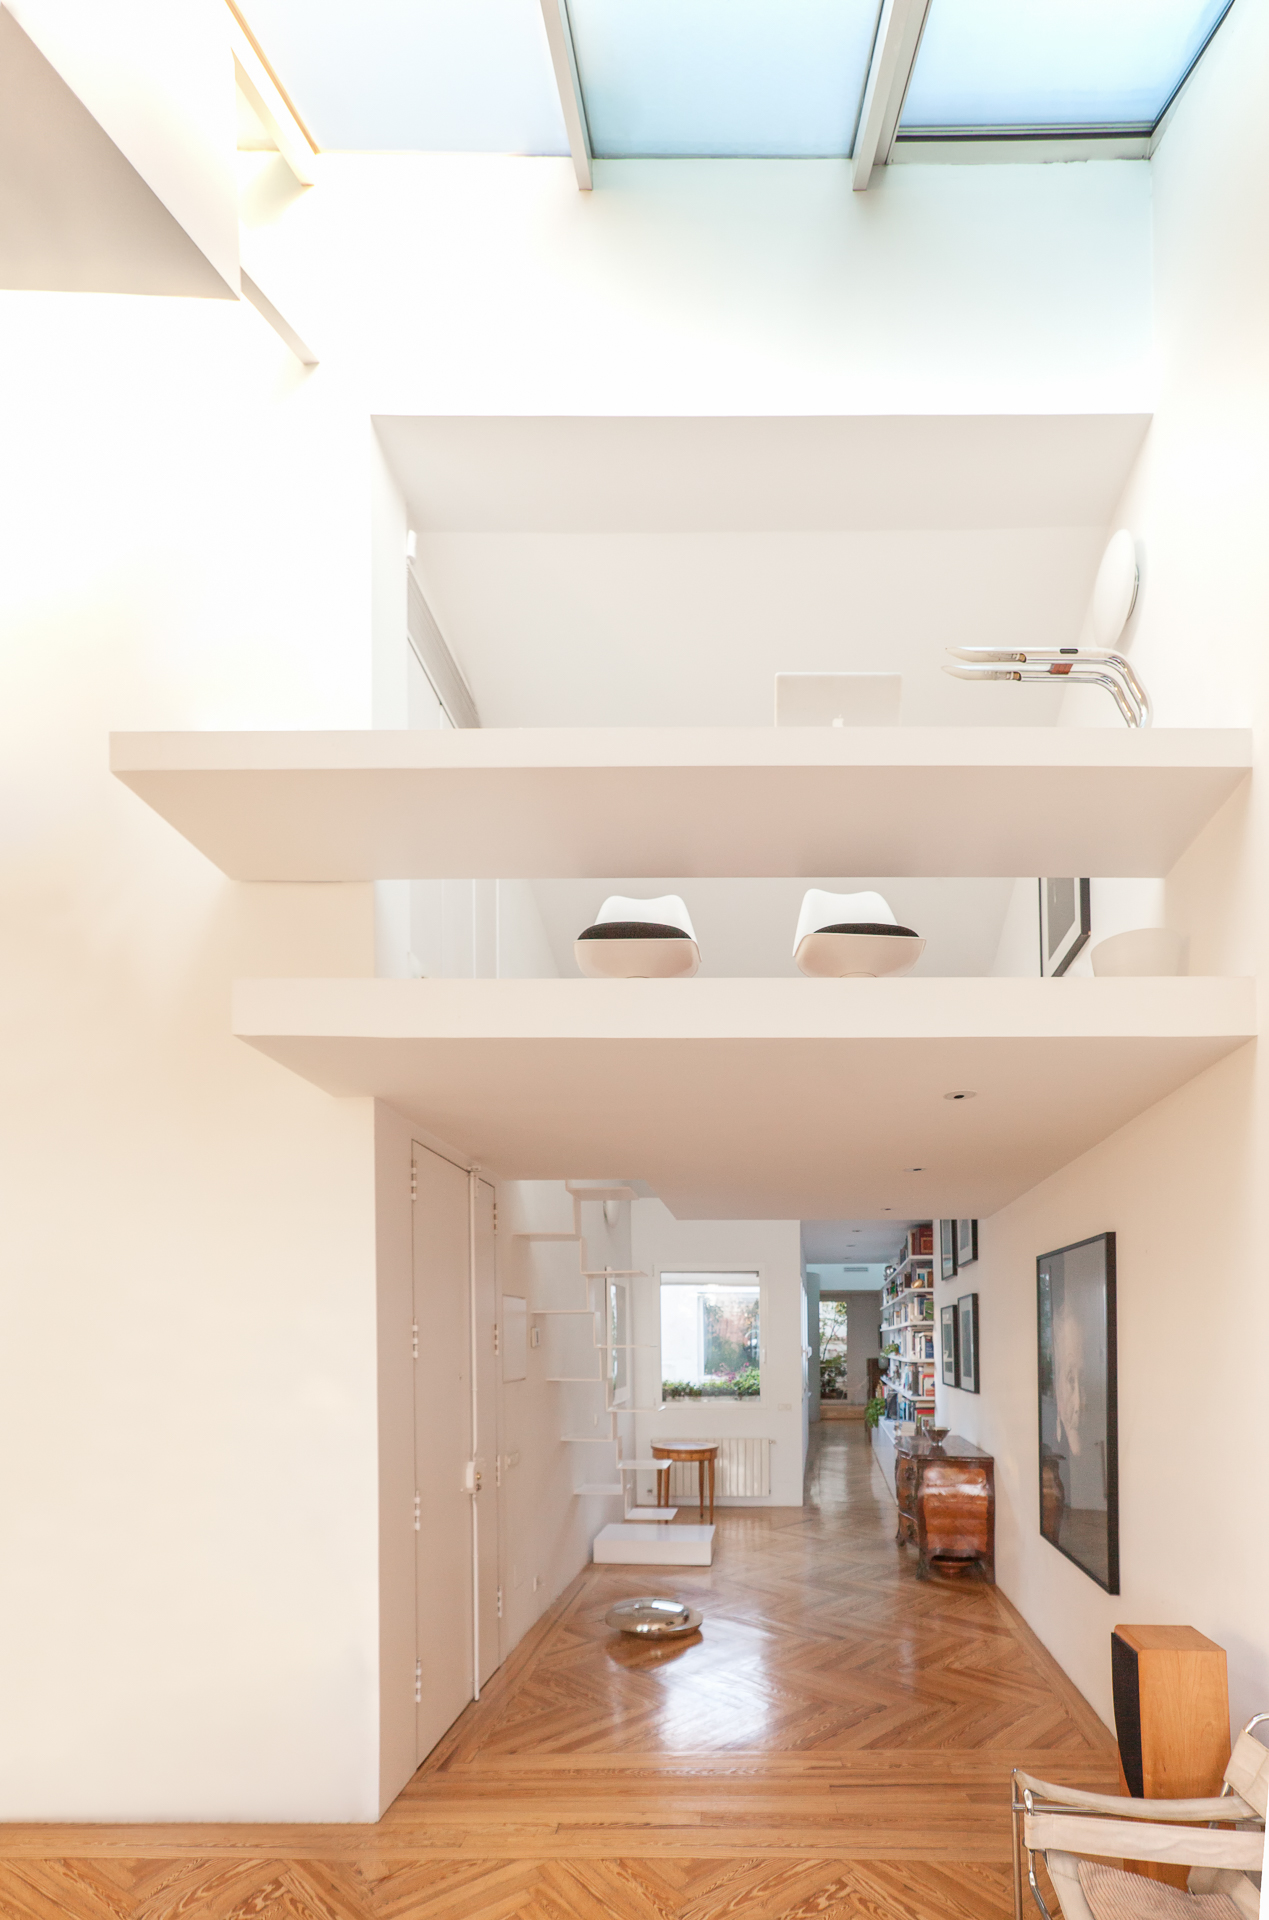 VALVERDE_Maroto_Ibañez_arquitectos02